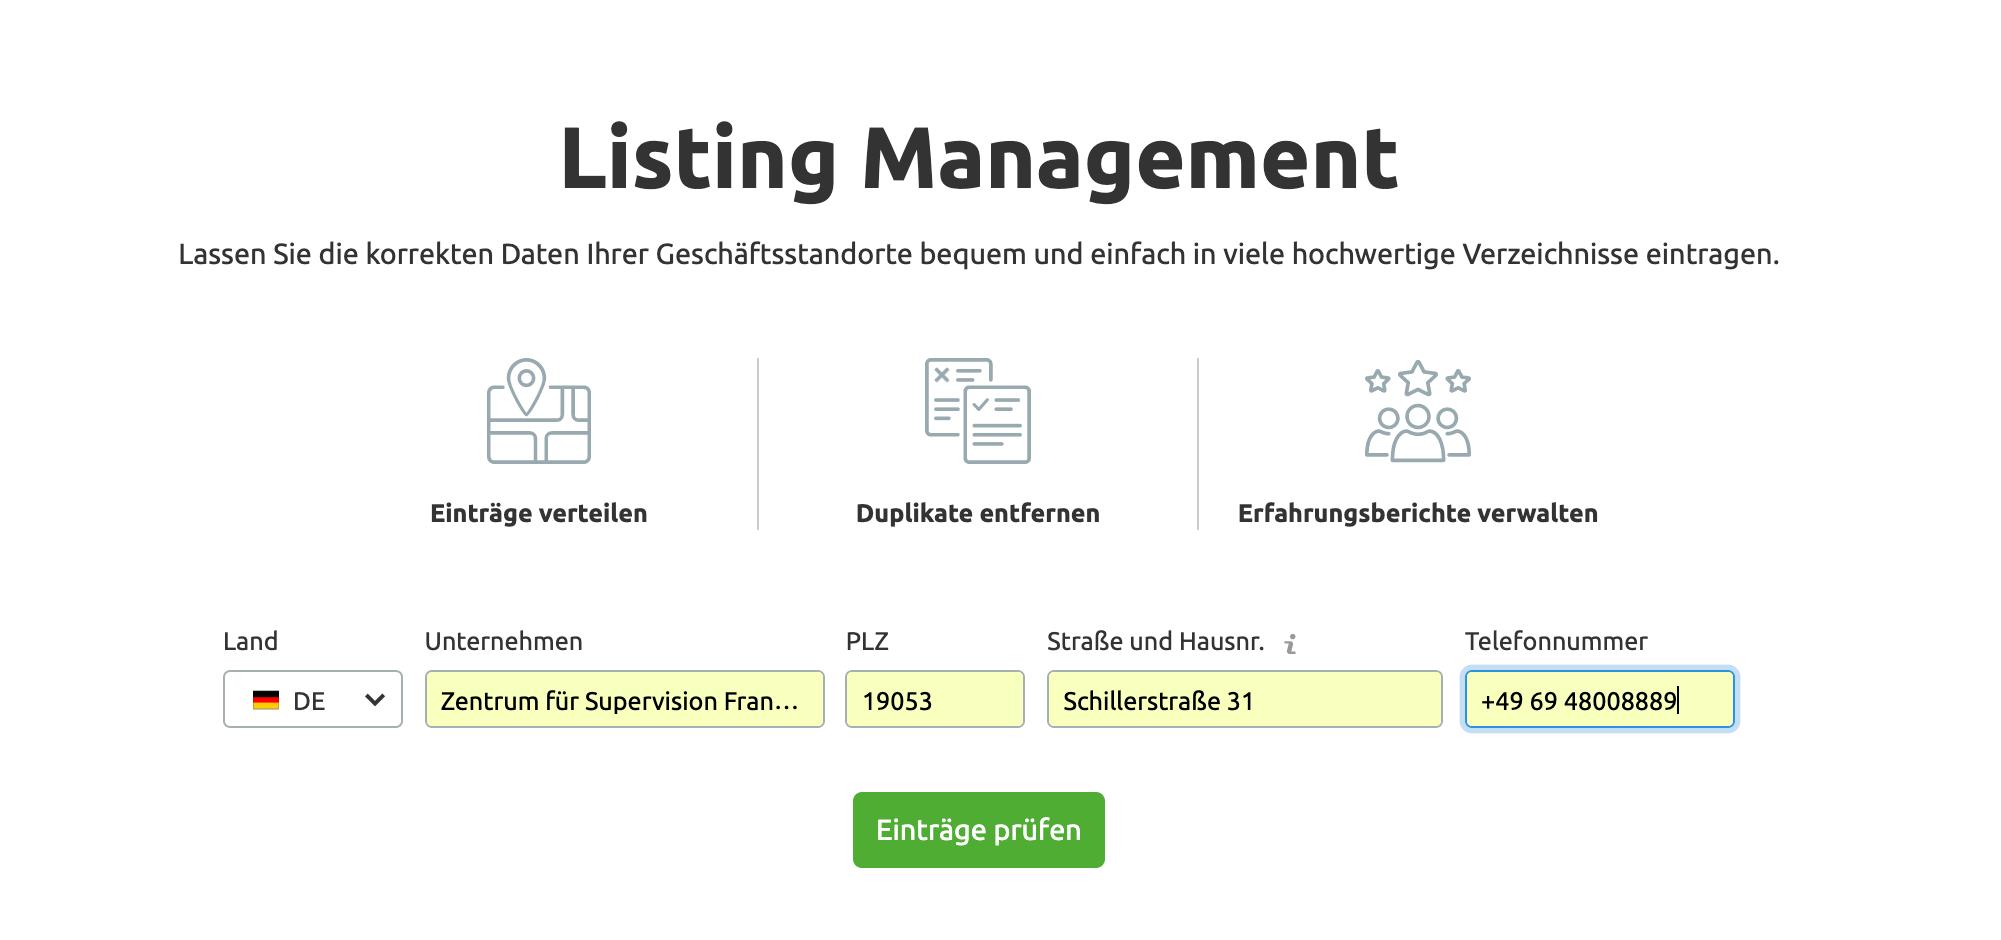 Listing Management Tool